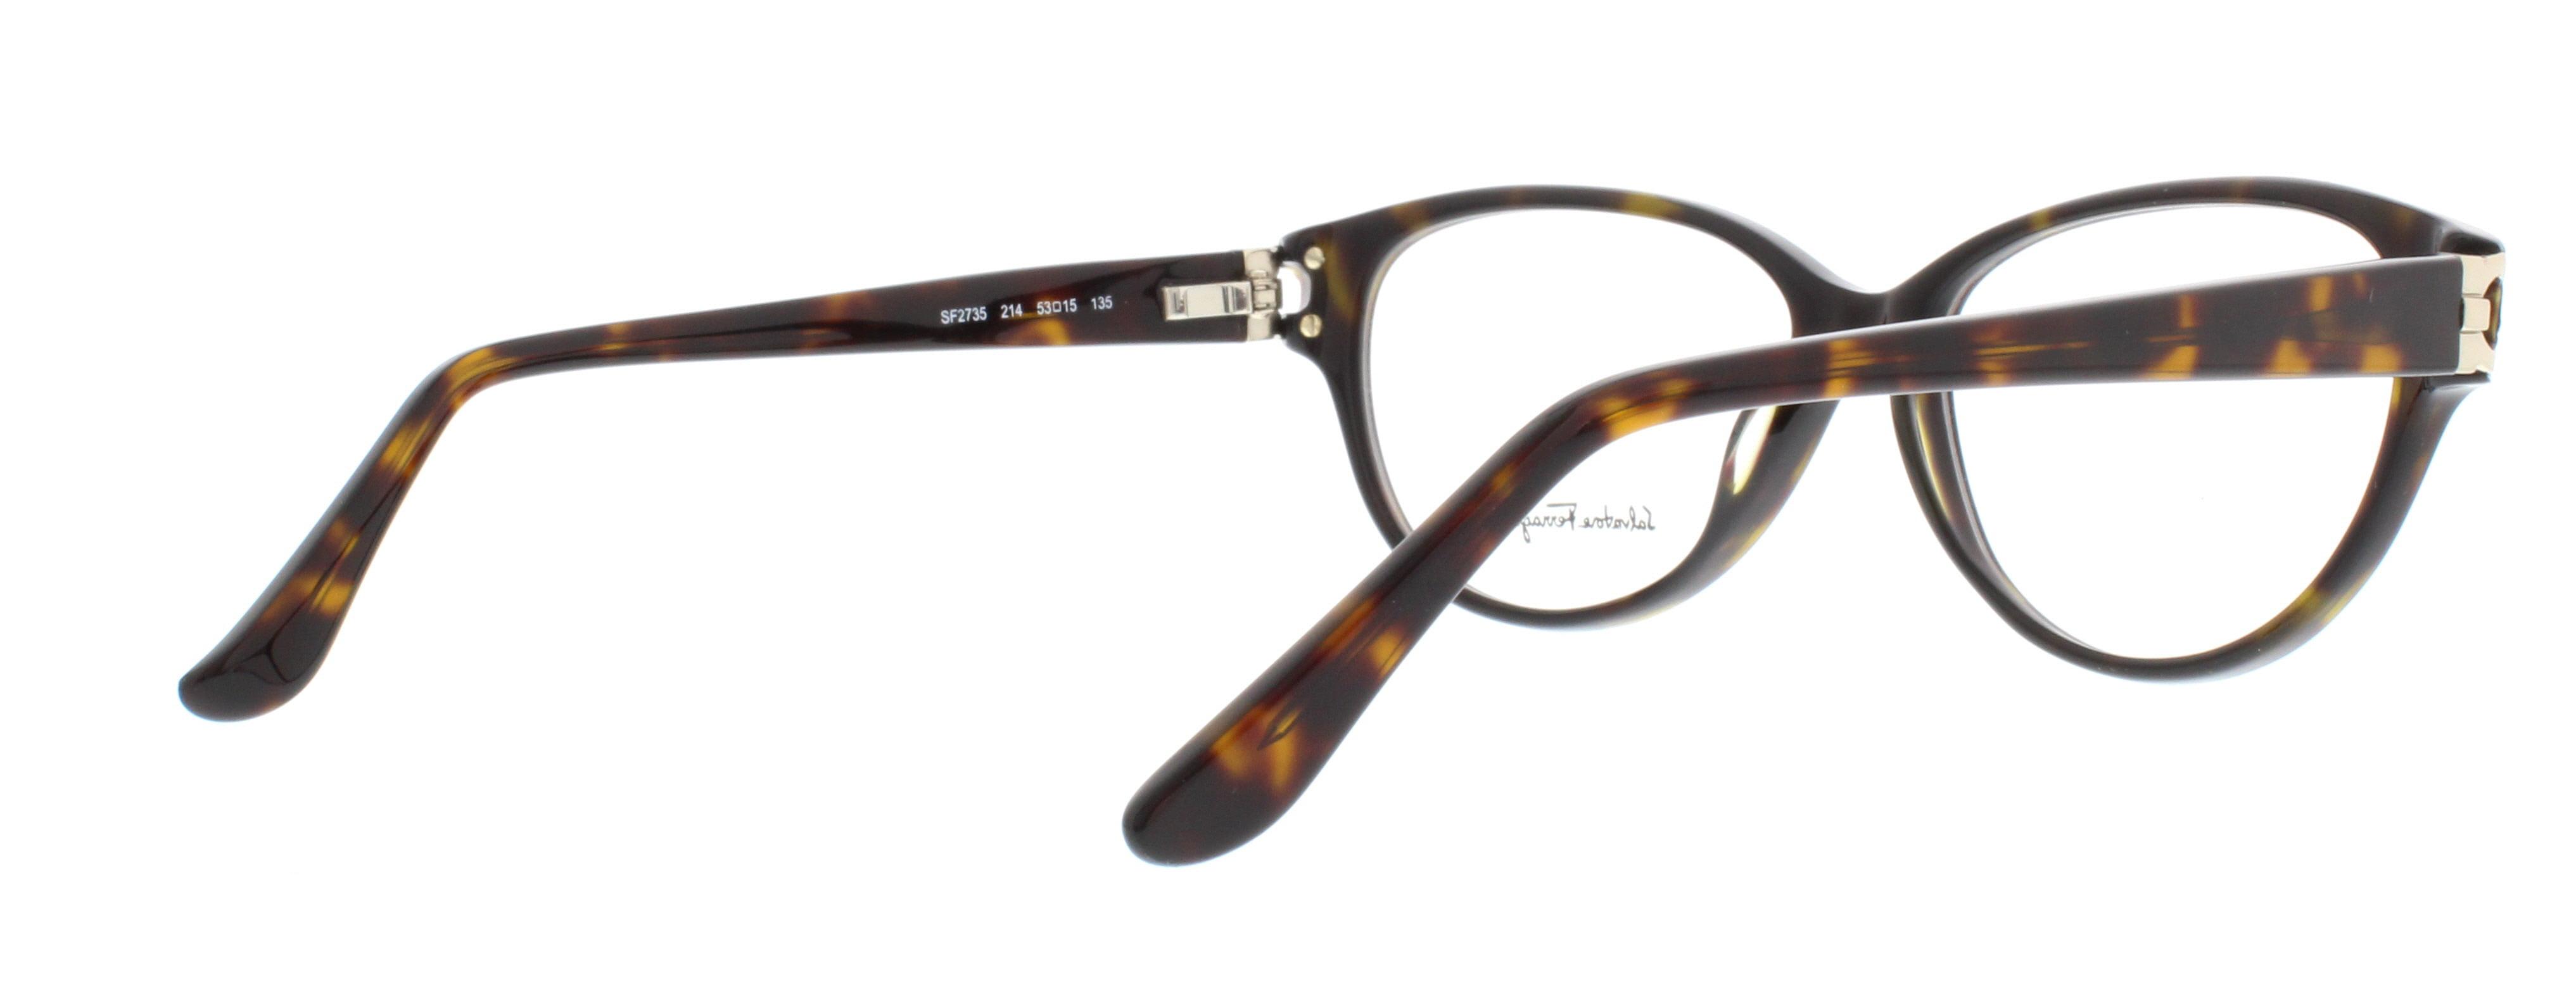 760b1f56ee SALVATORE FERRAGAMO Eyeglasses SF2735 214 Tortoise 53MM - Walmart.com